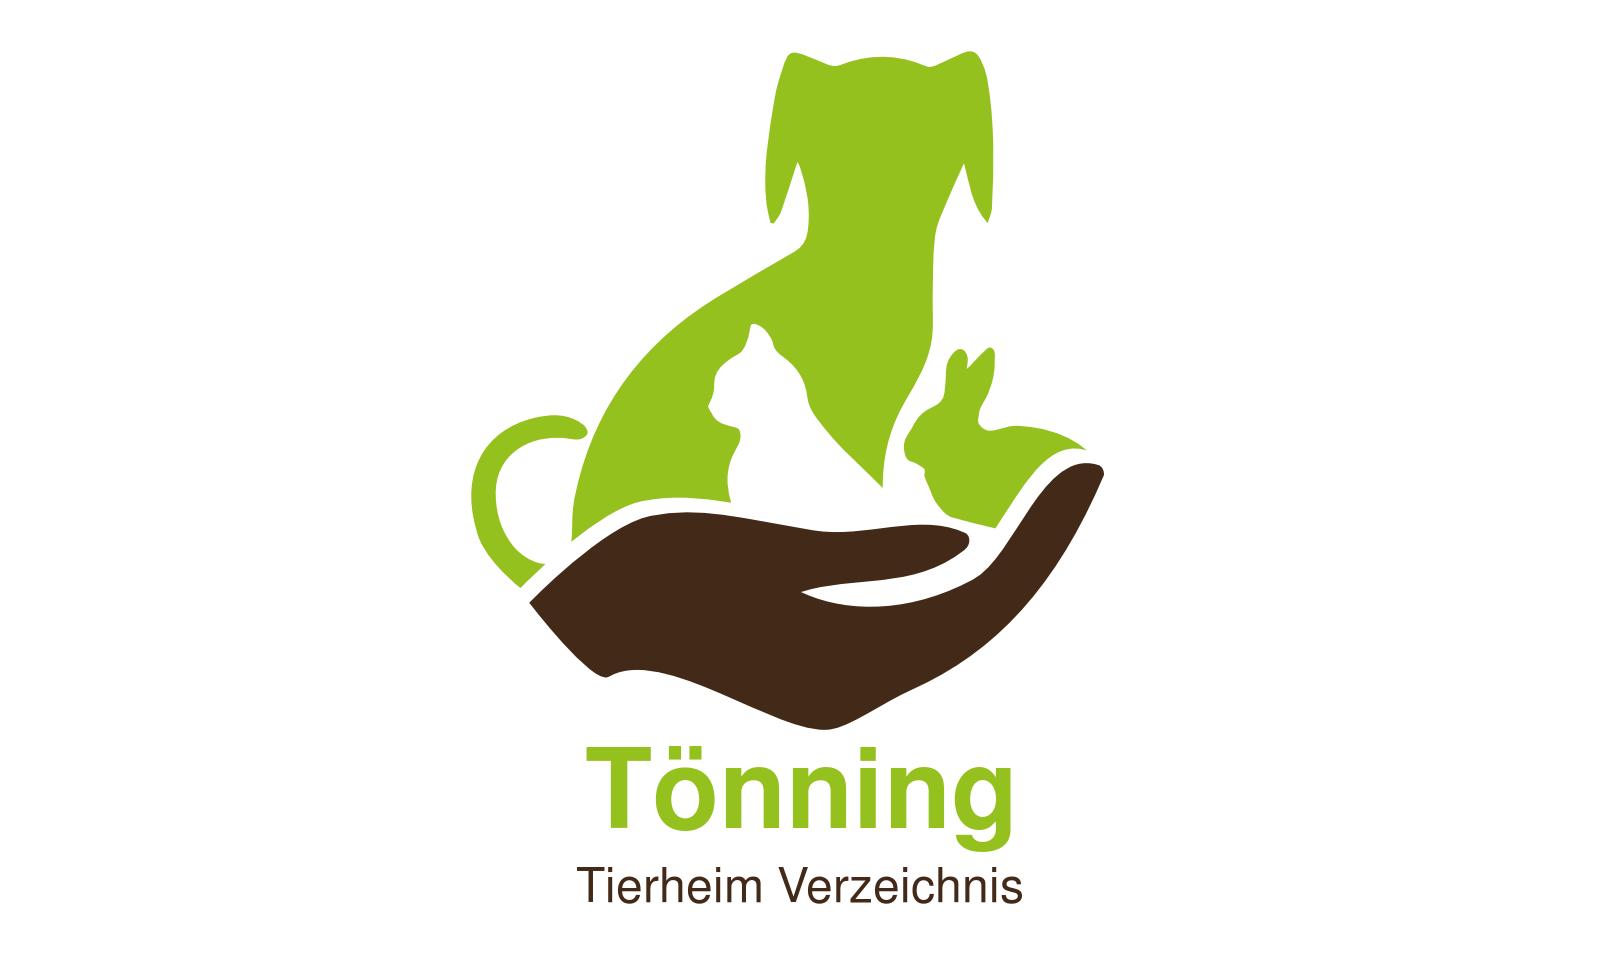 Tierheim Tönning